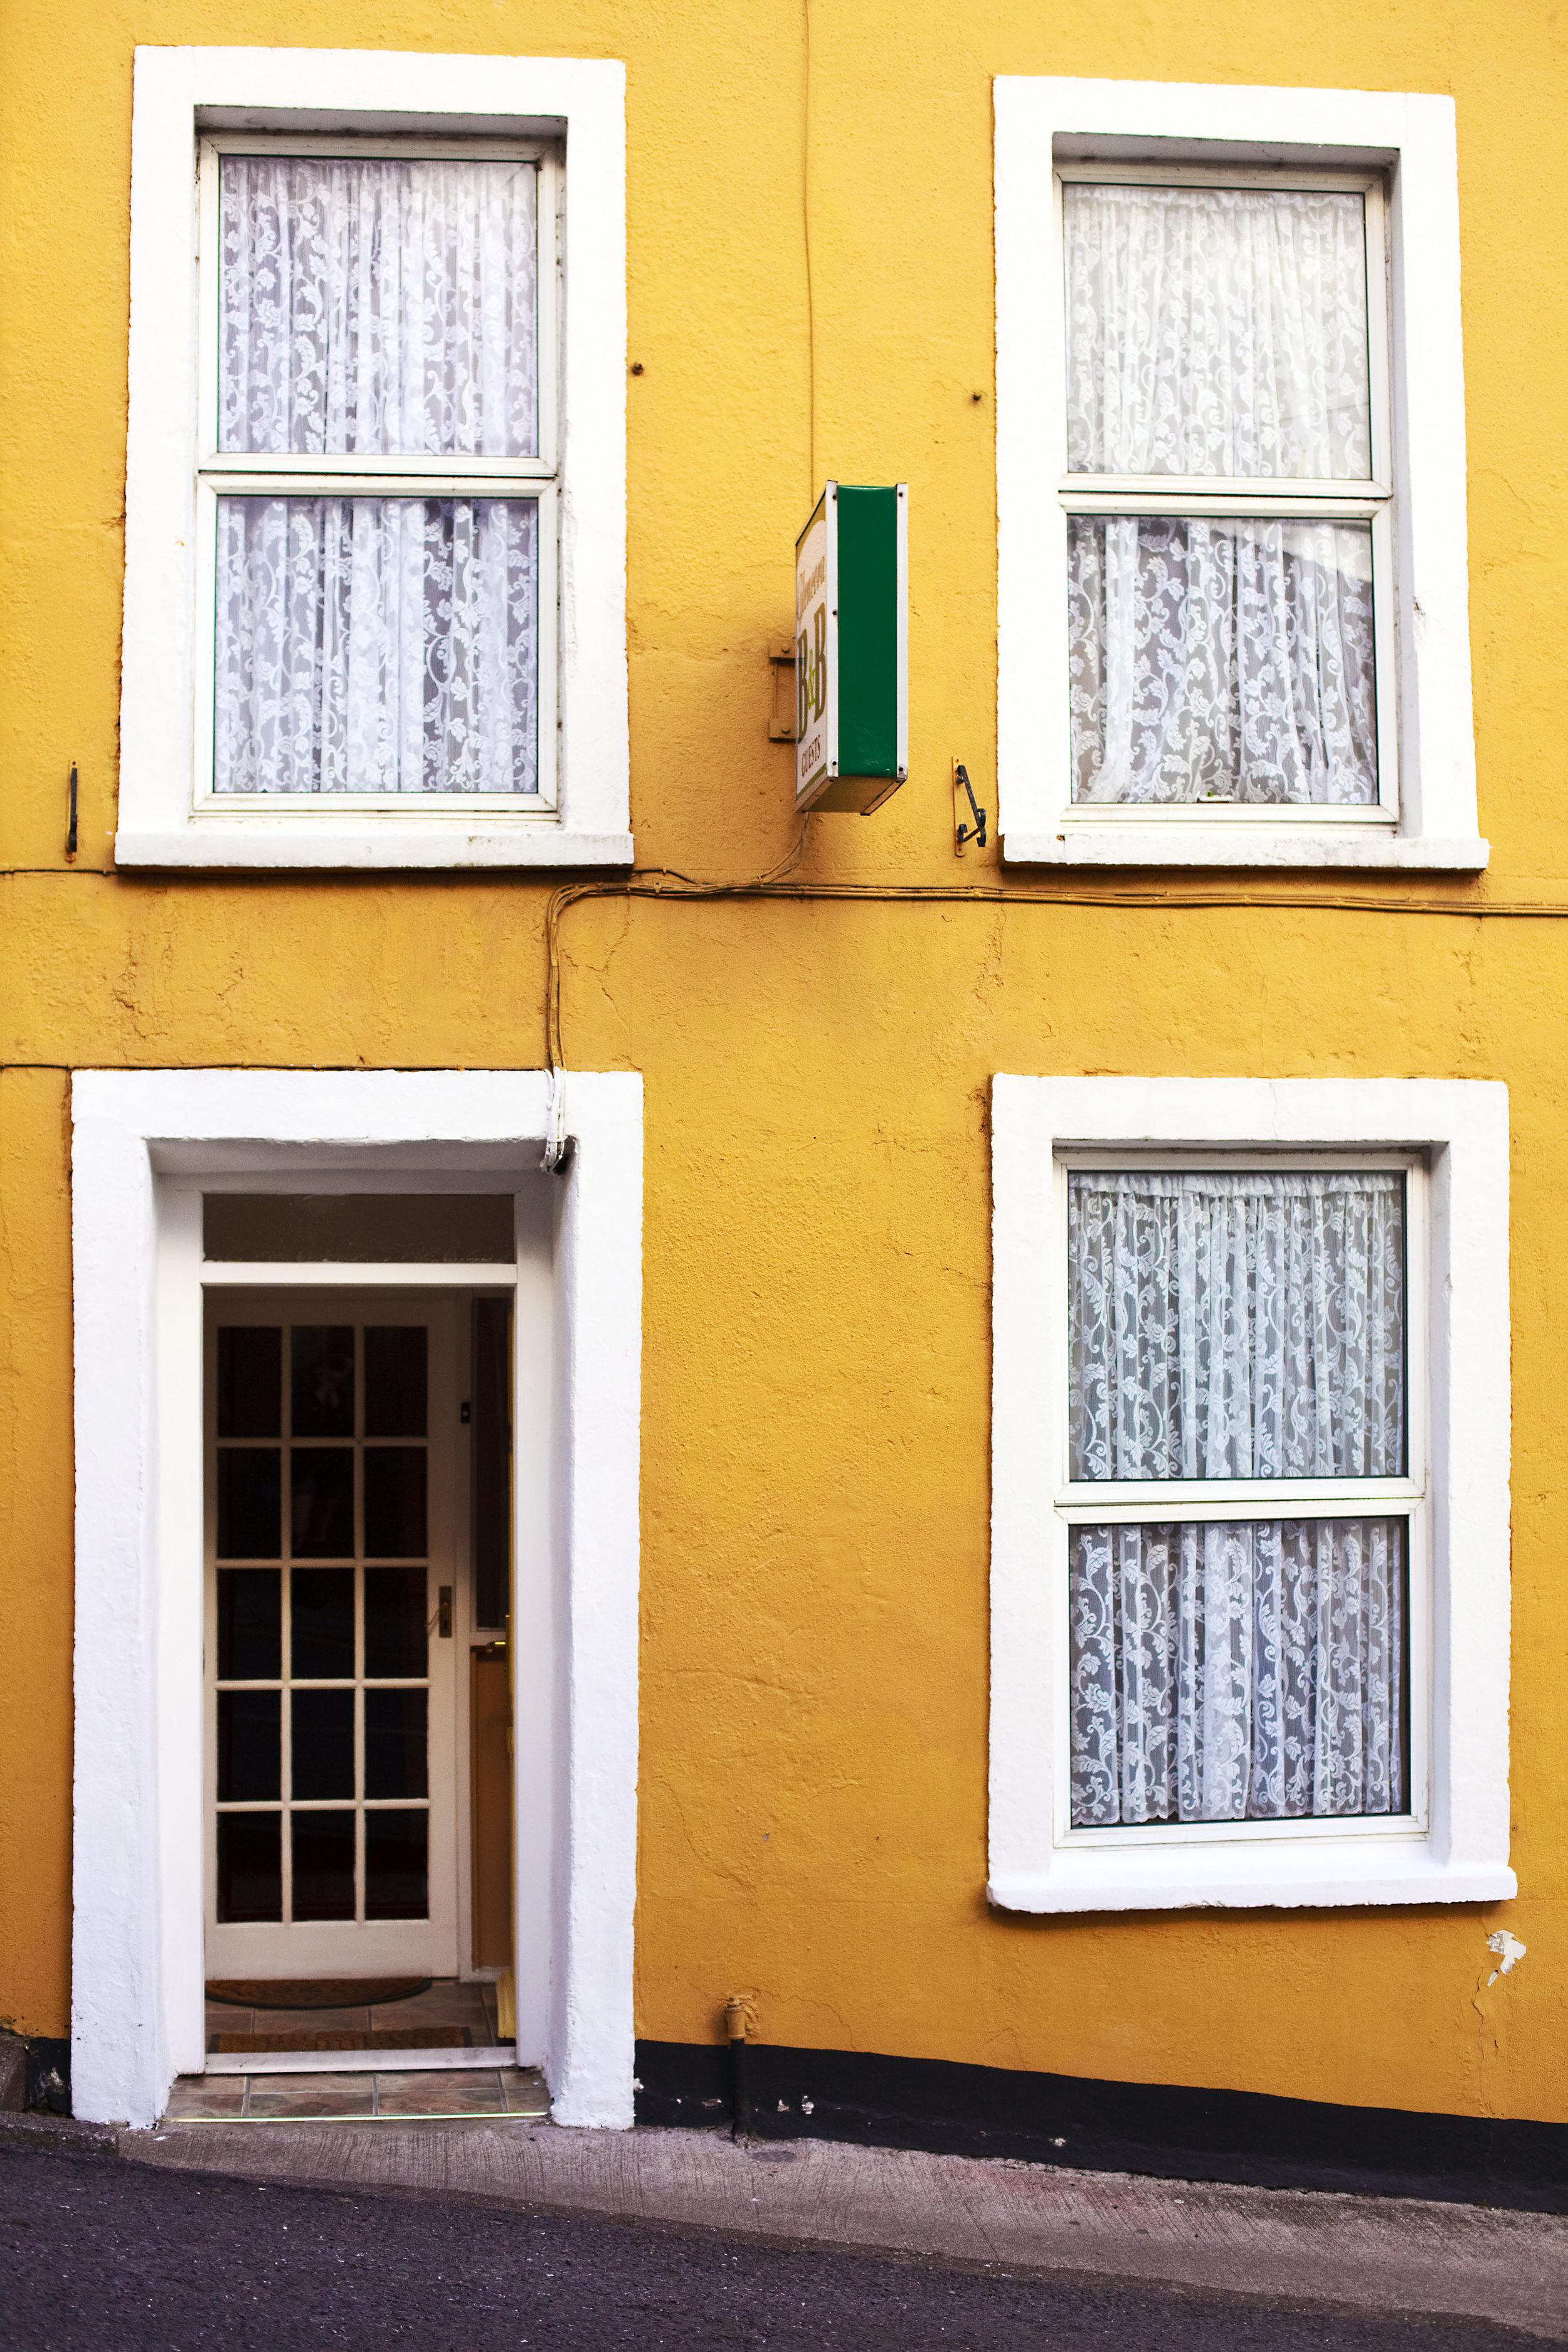 LP_YellowHouse.jpg